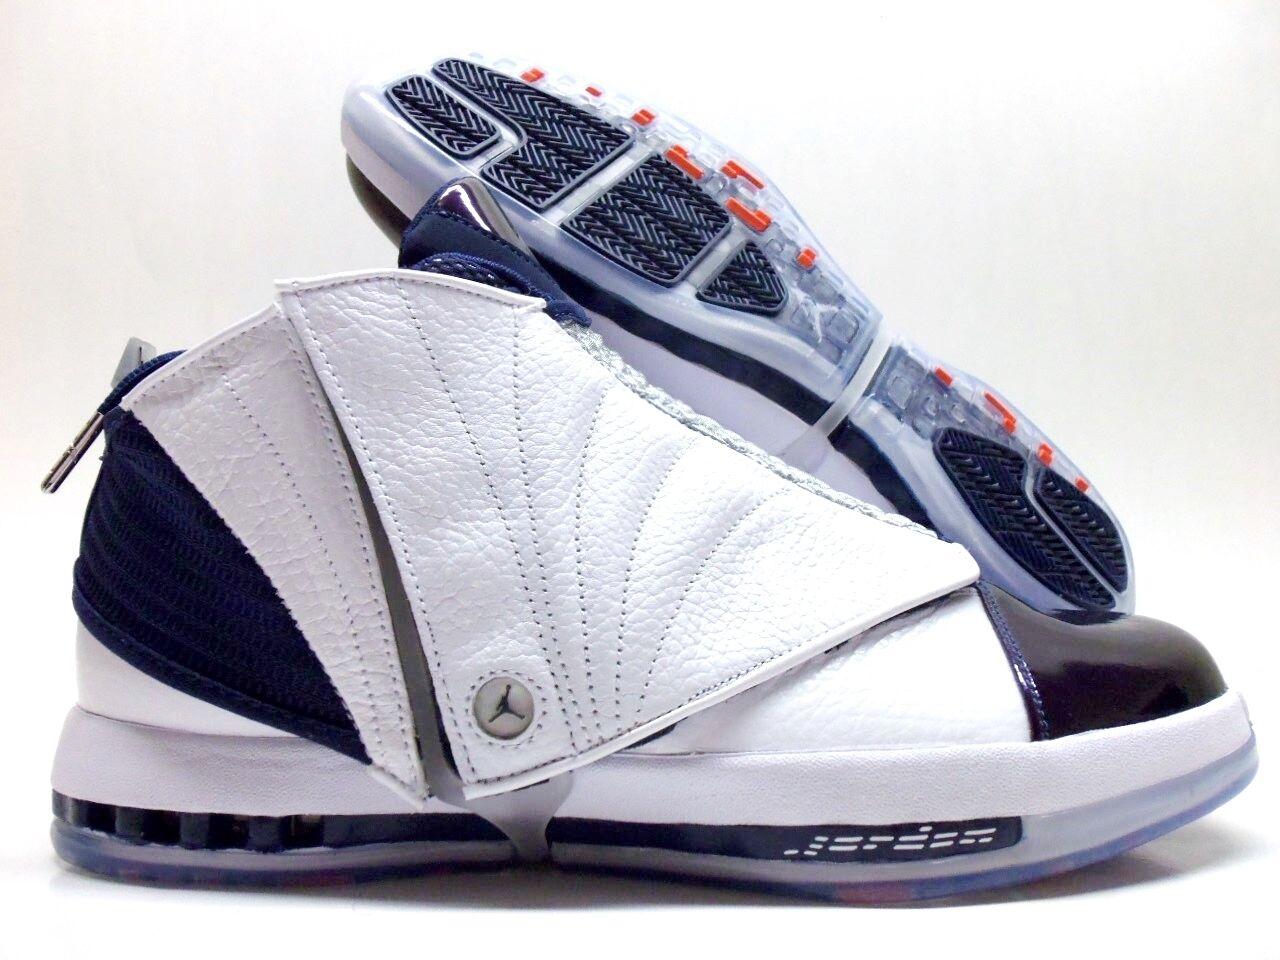 best sneakers 9b863 08ab3 ... italy nike air jordan 16 retro weiße männer mitternacht marine größe  männer 10 c5c56 f8070